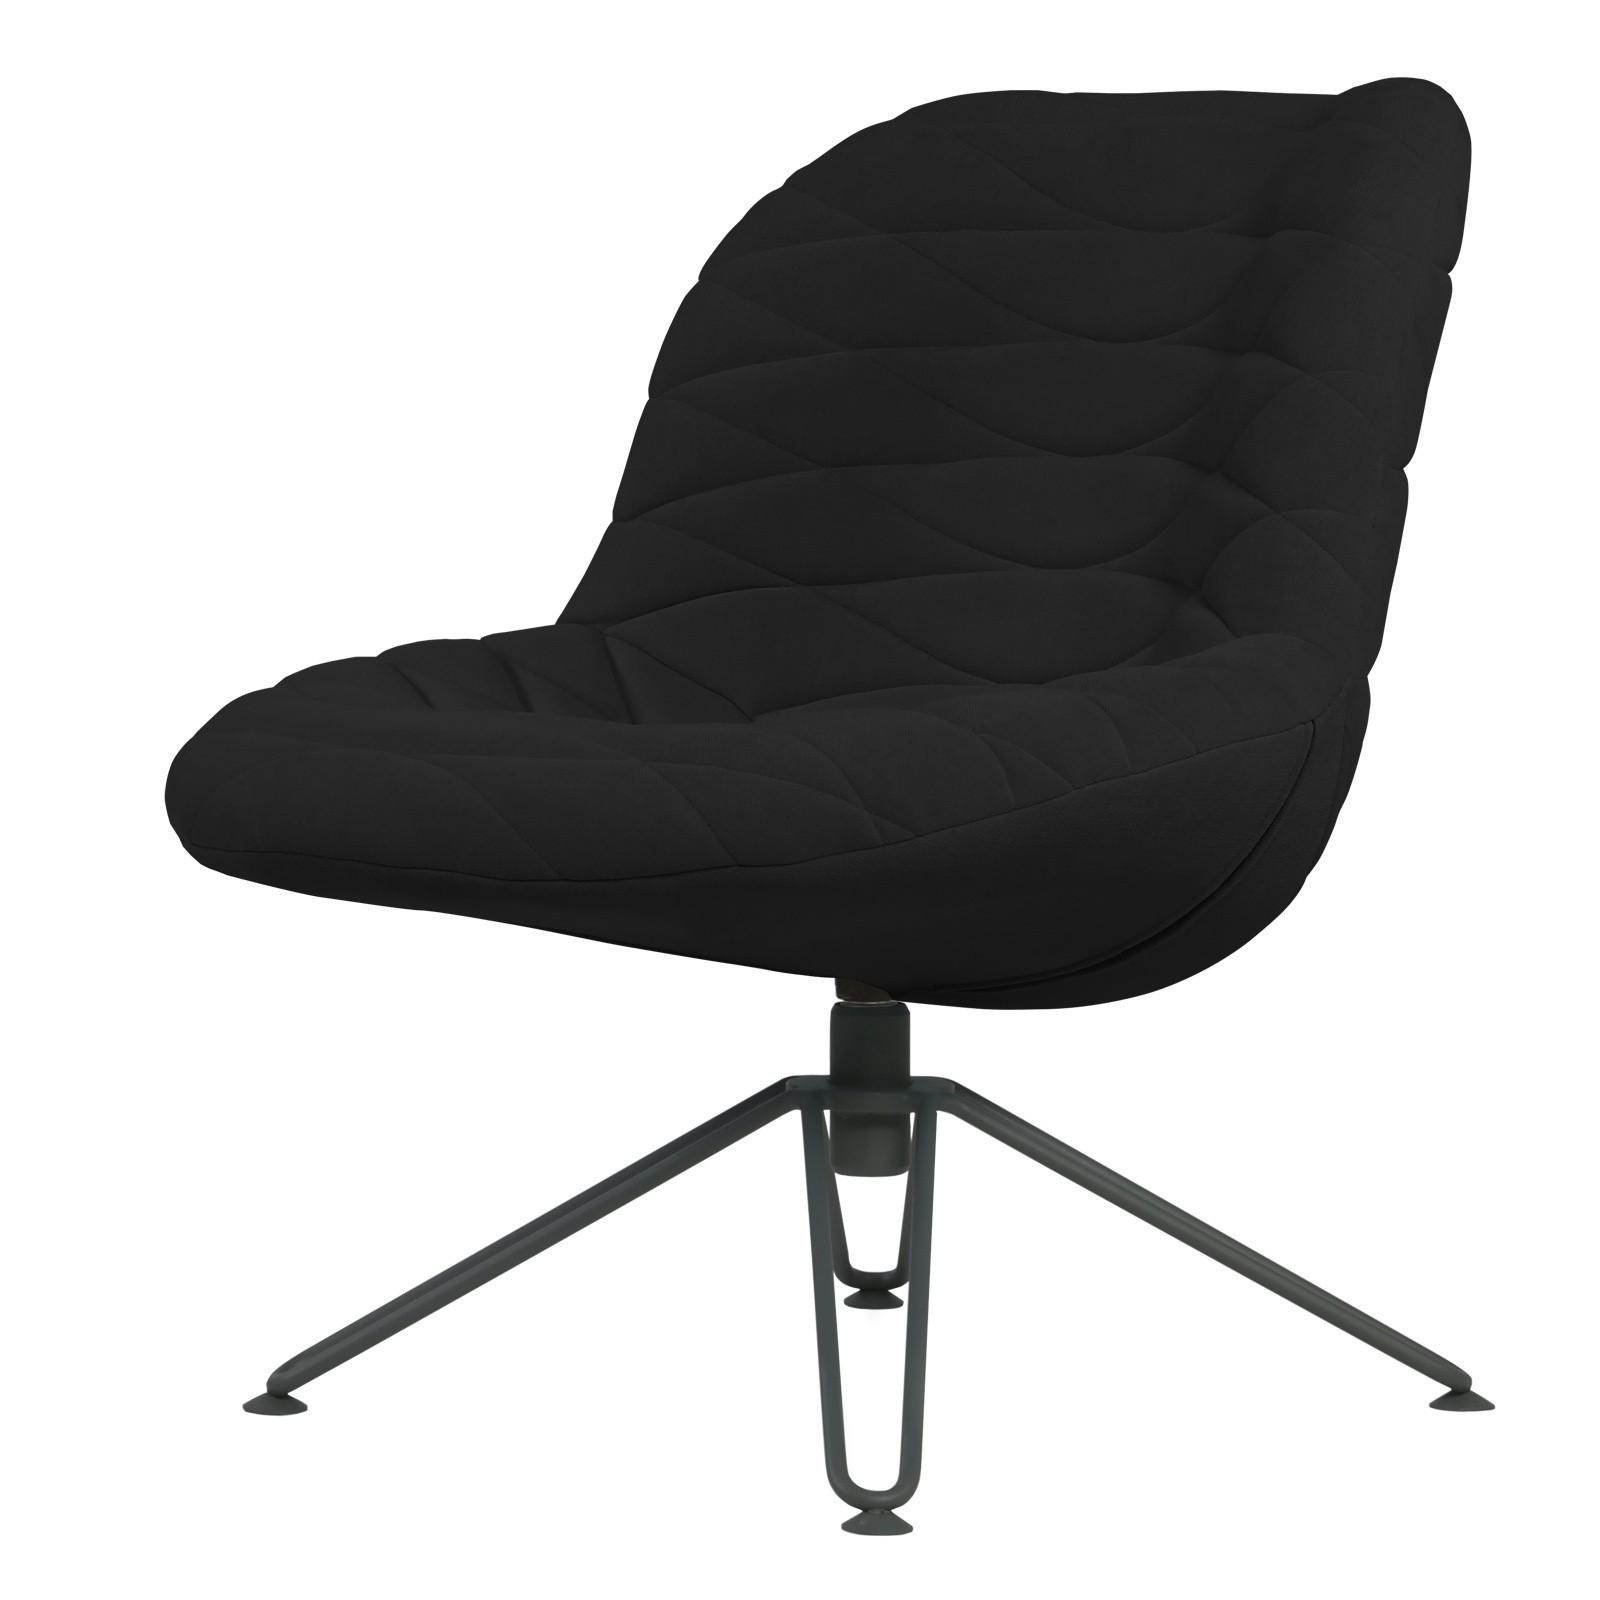 Mannequin Lounge 03 - black